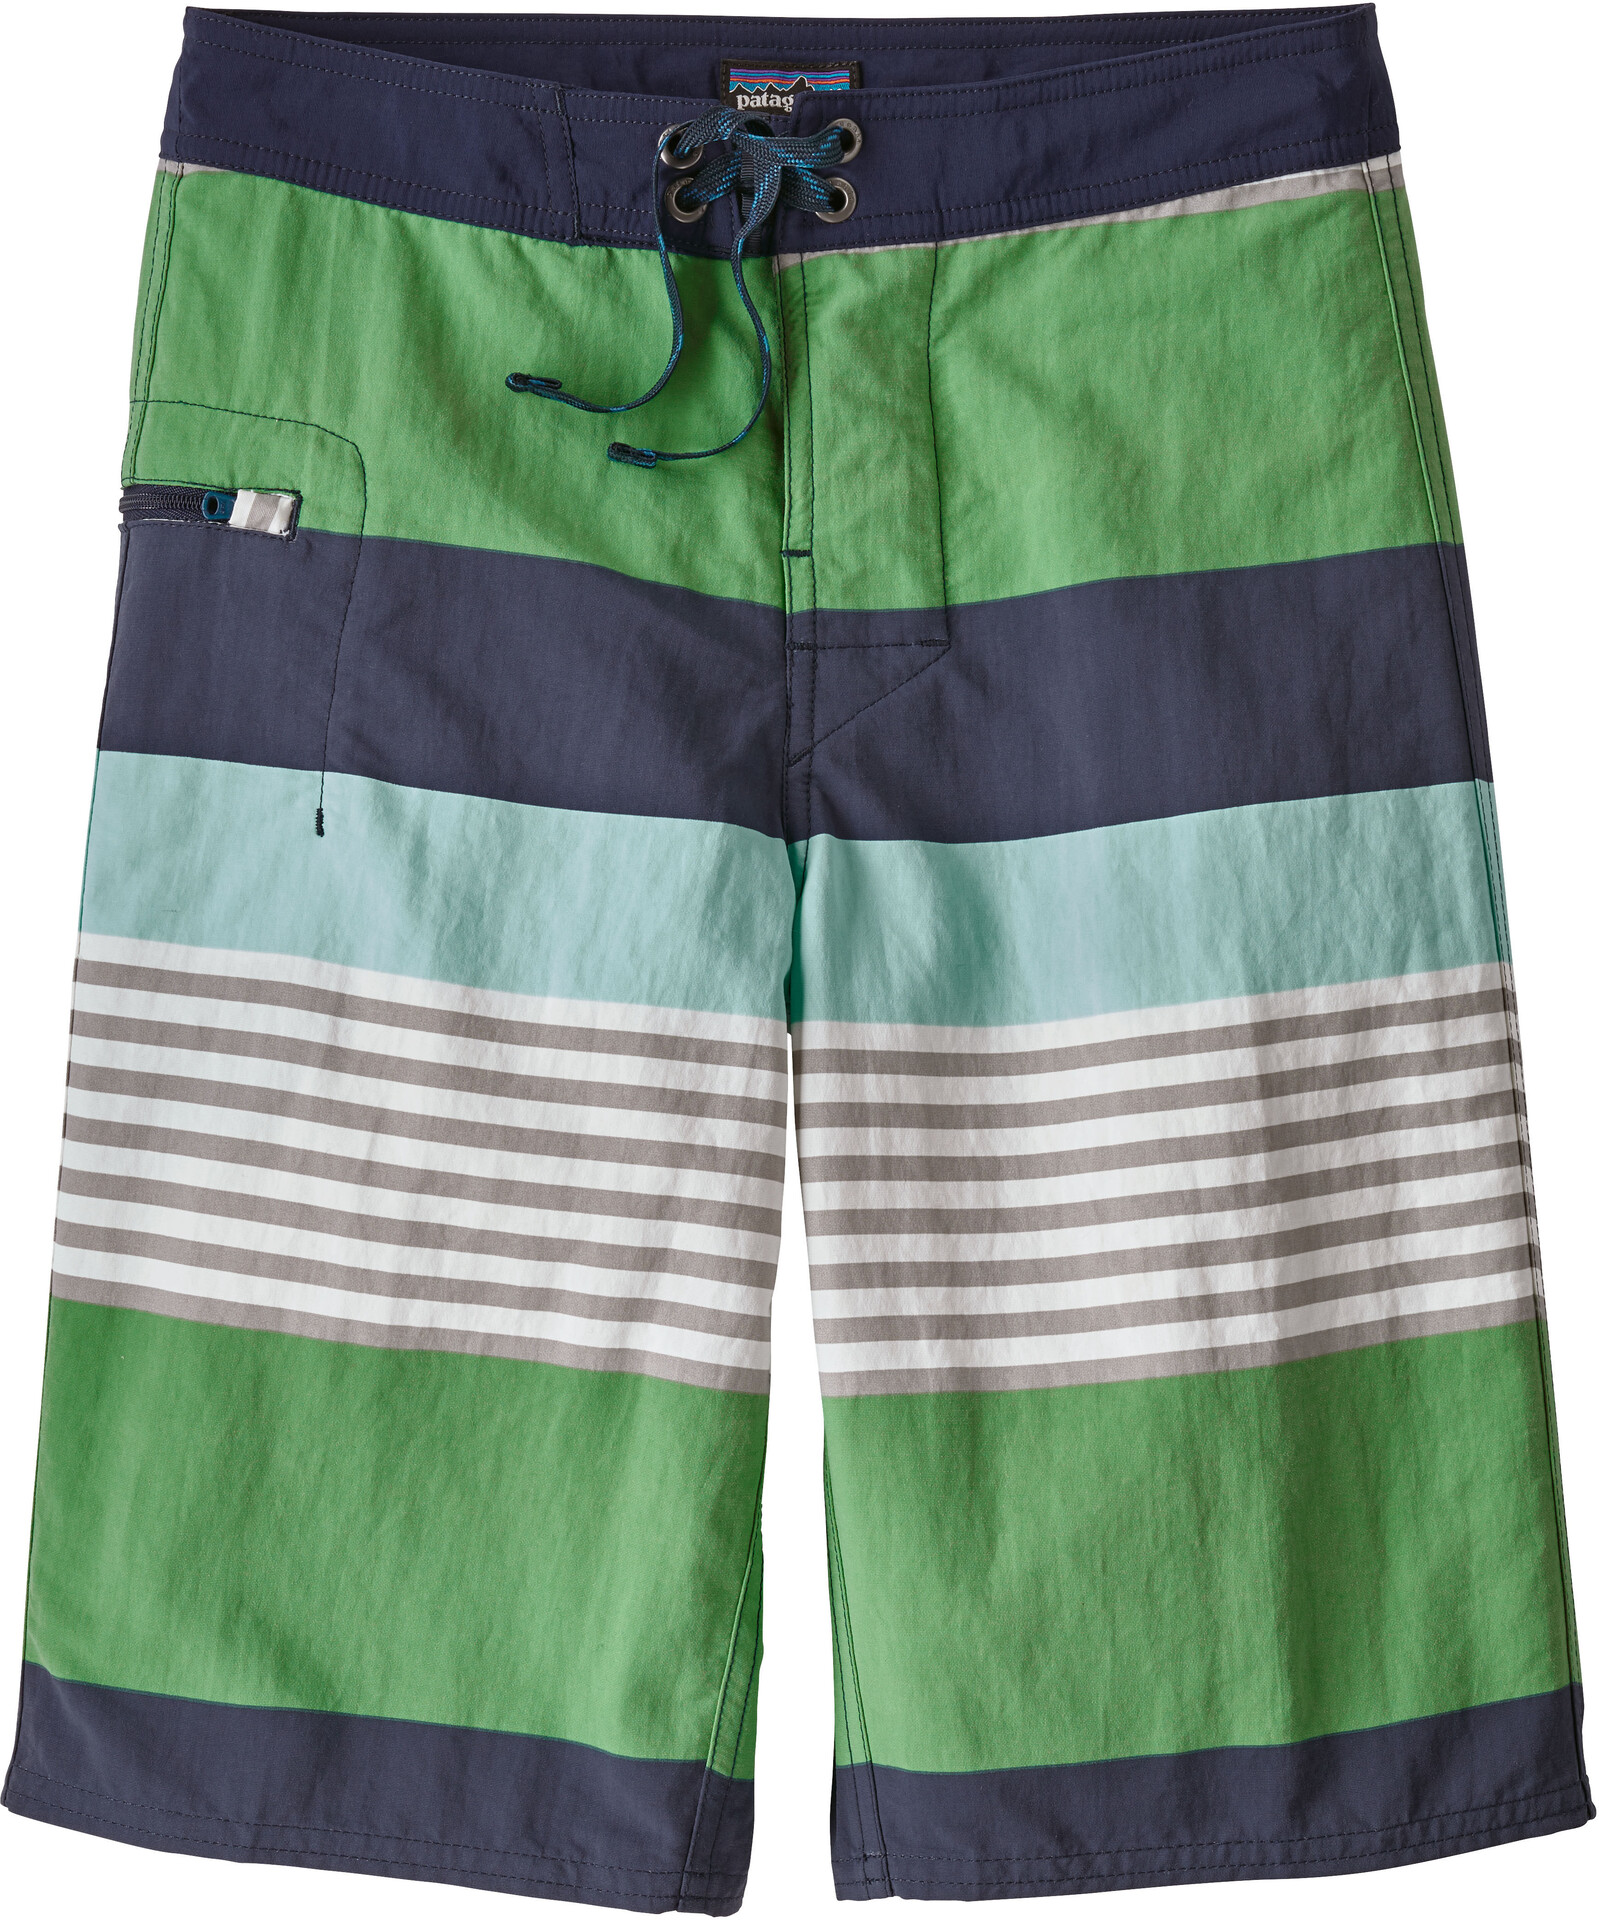 Patagonia Boys Wavefarer Boardshorts Fitz Stripe: Stripe: Stripe: Succulent Grön 9f6fa0